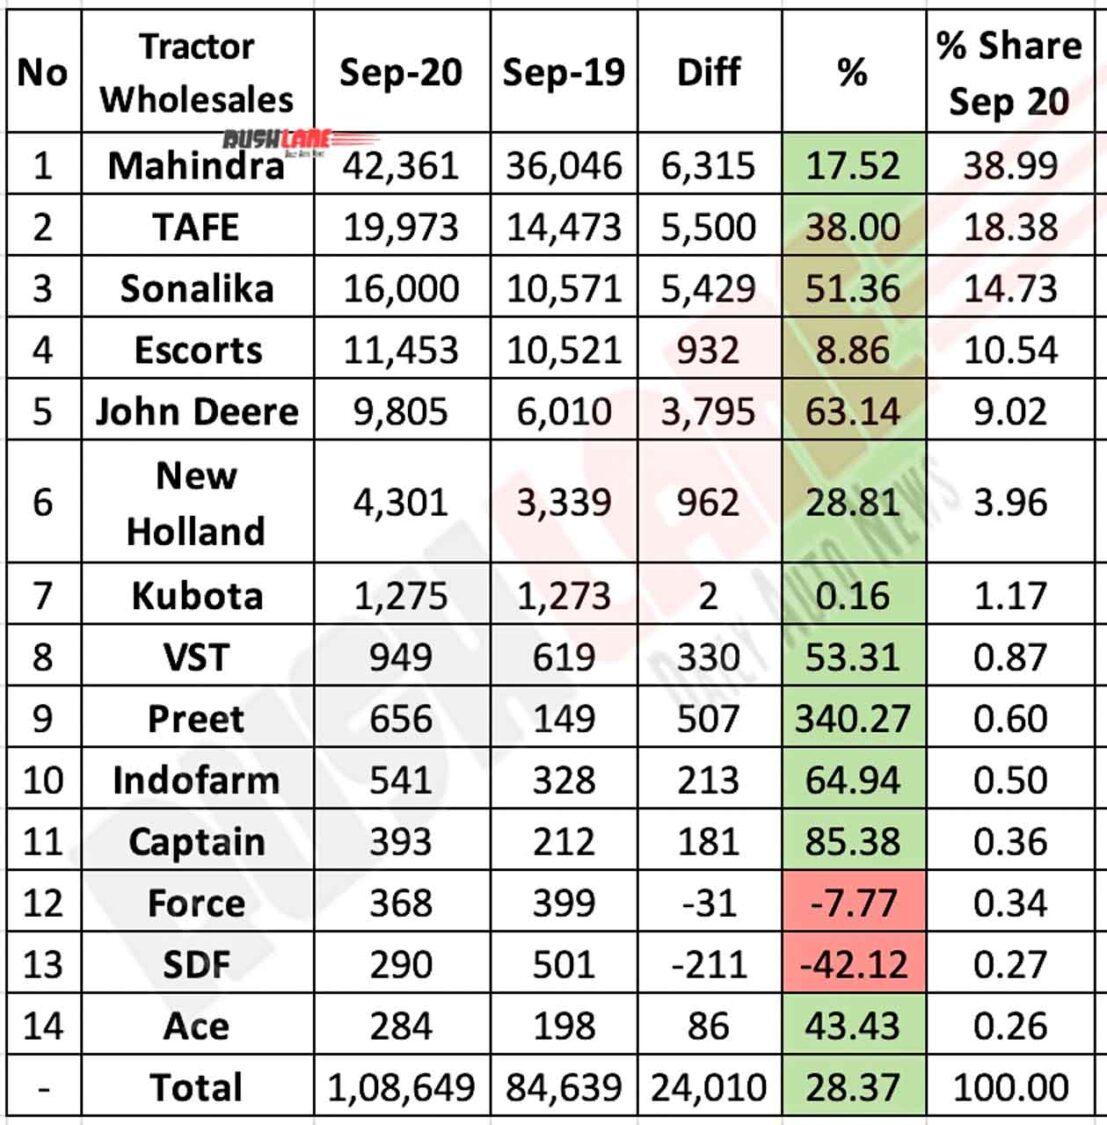 Tractor Sales Sep 2020